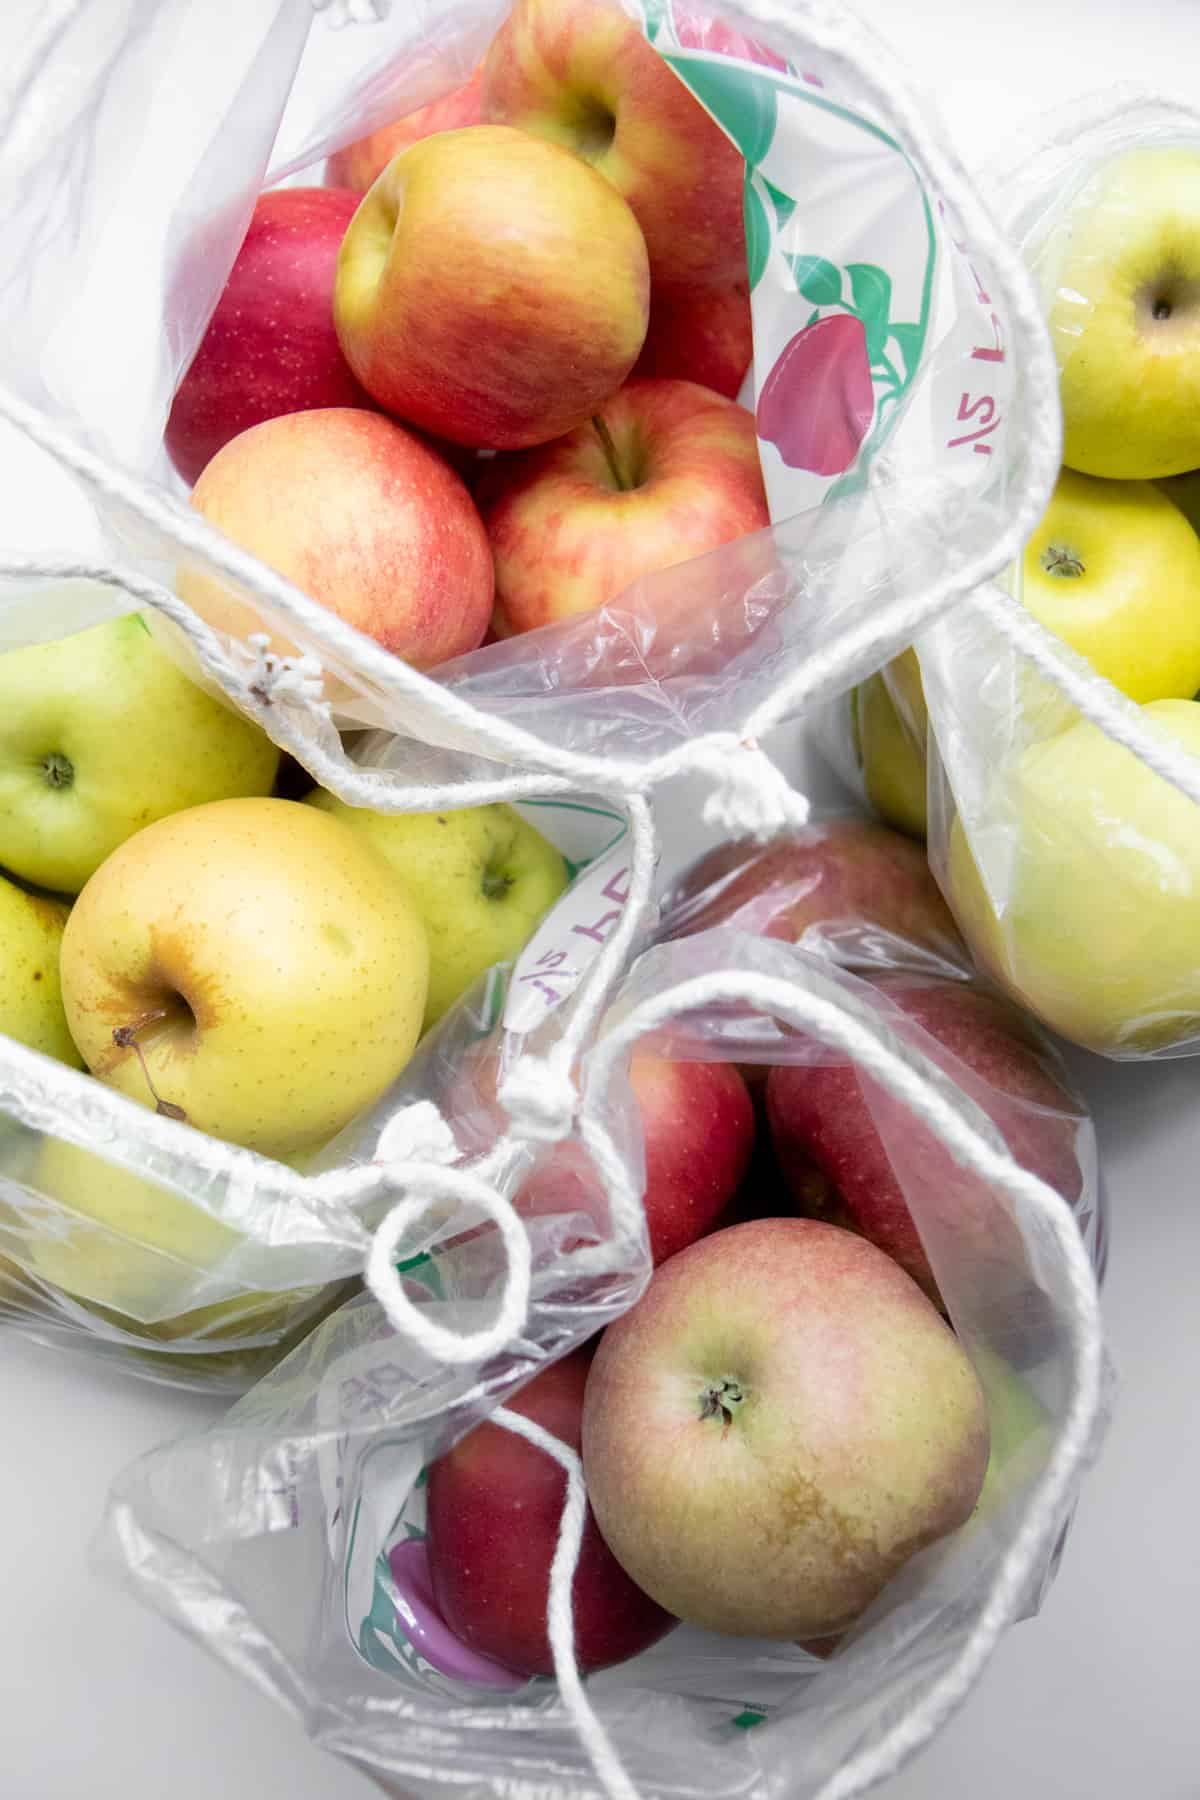 Clear plastic drawstring bags full of apples.